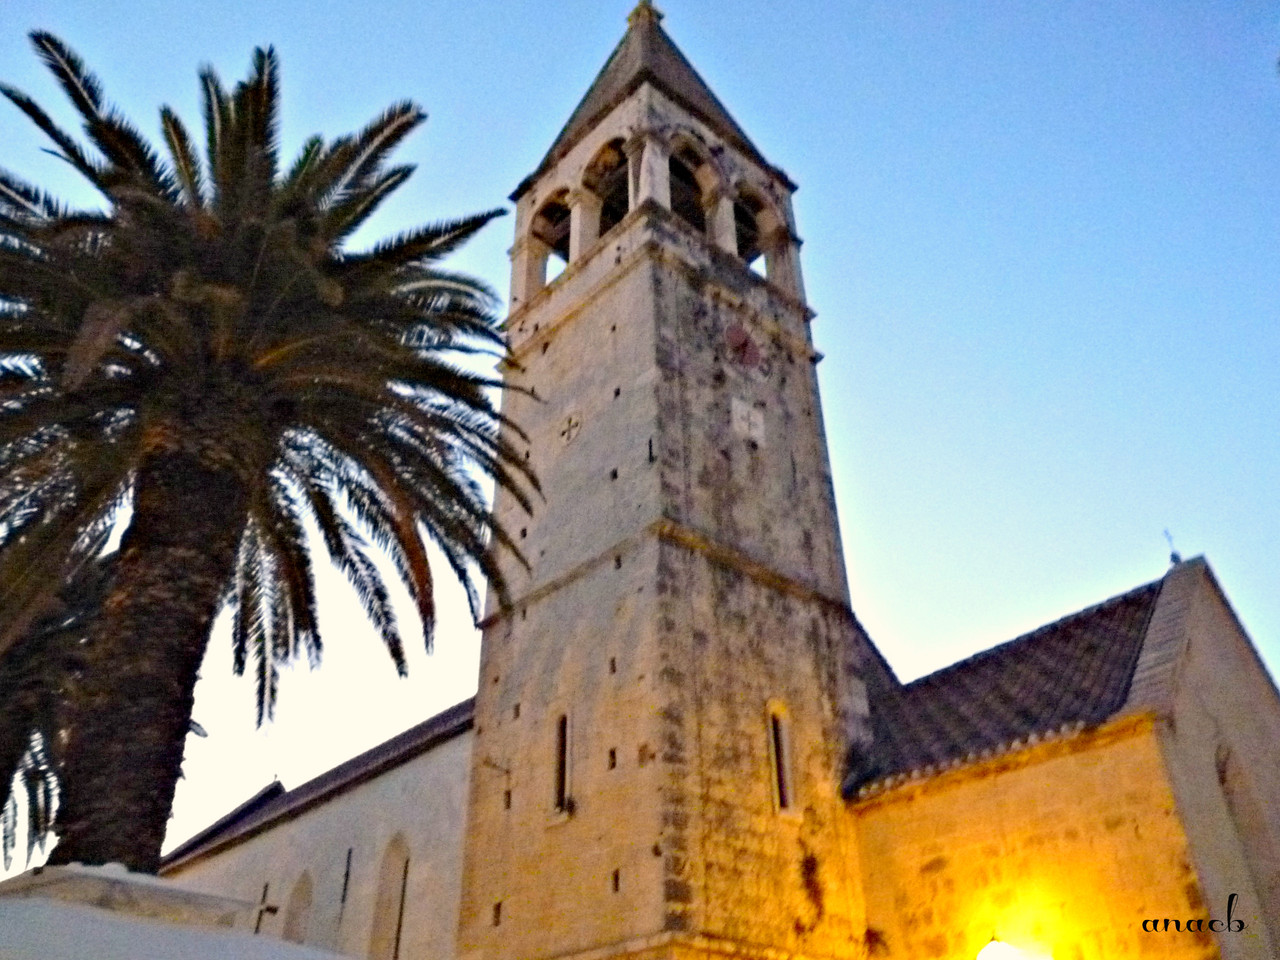 Trogir - St. Dominic's monastery - viajarporquesim